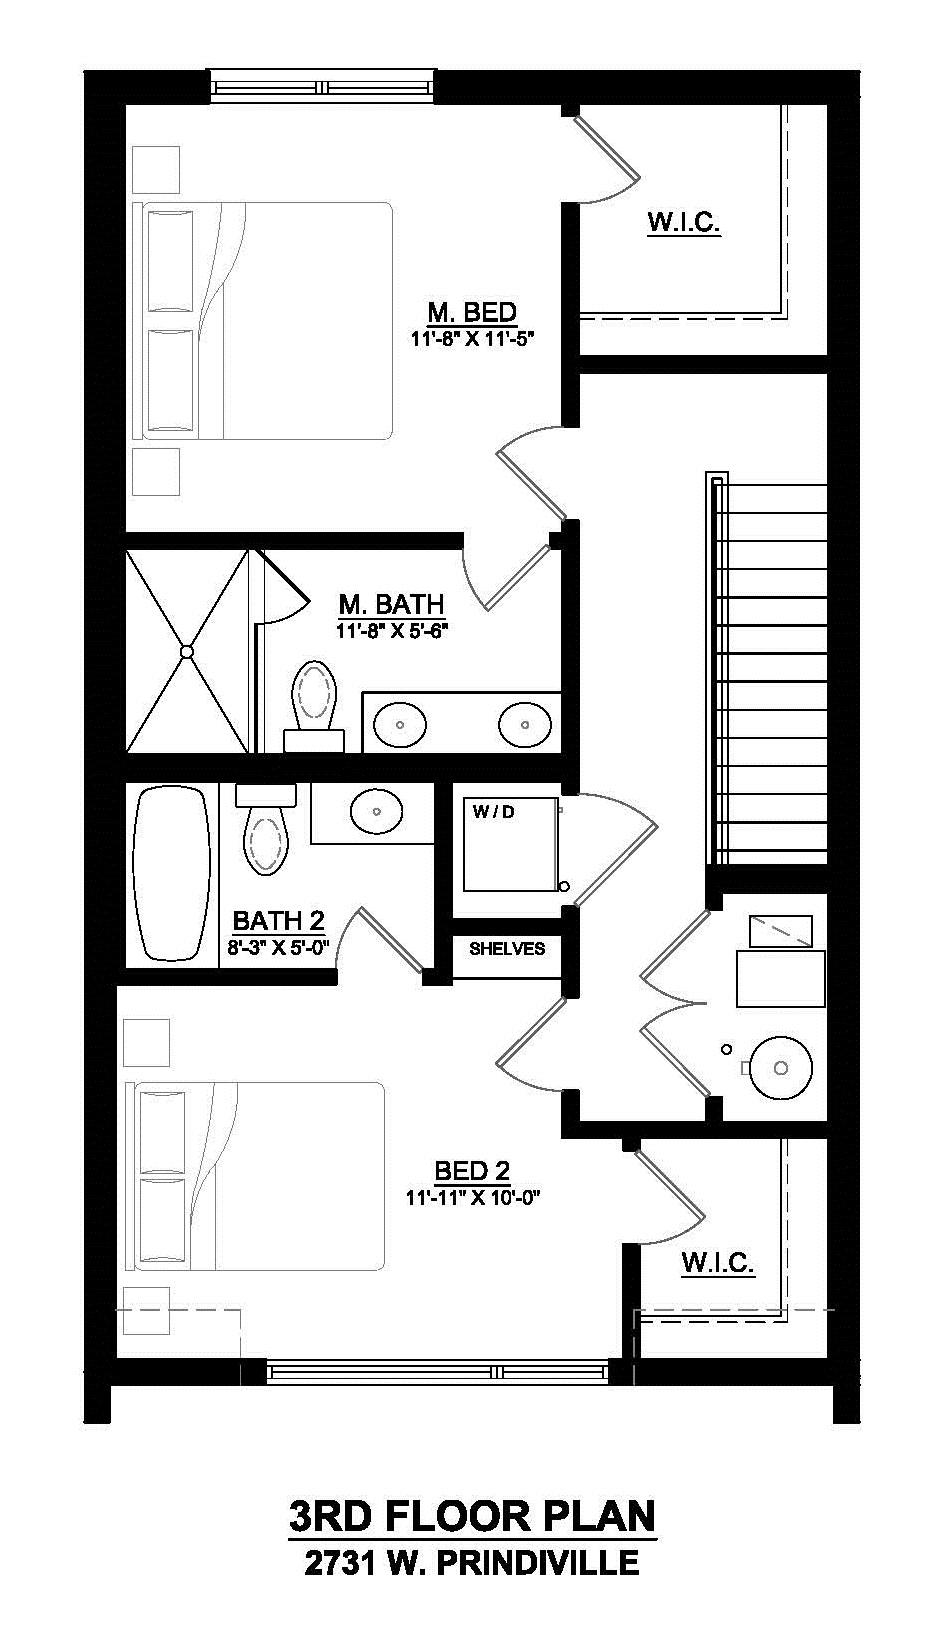 2731 W. Prindiville - Marketing Plans[1] 3.jpg